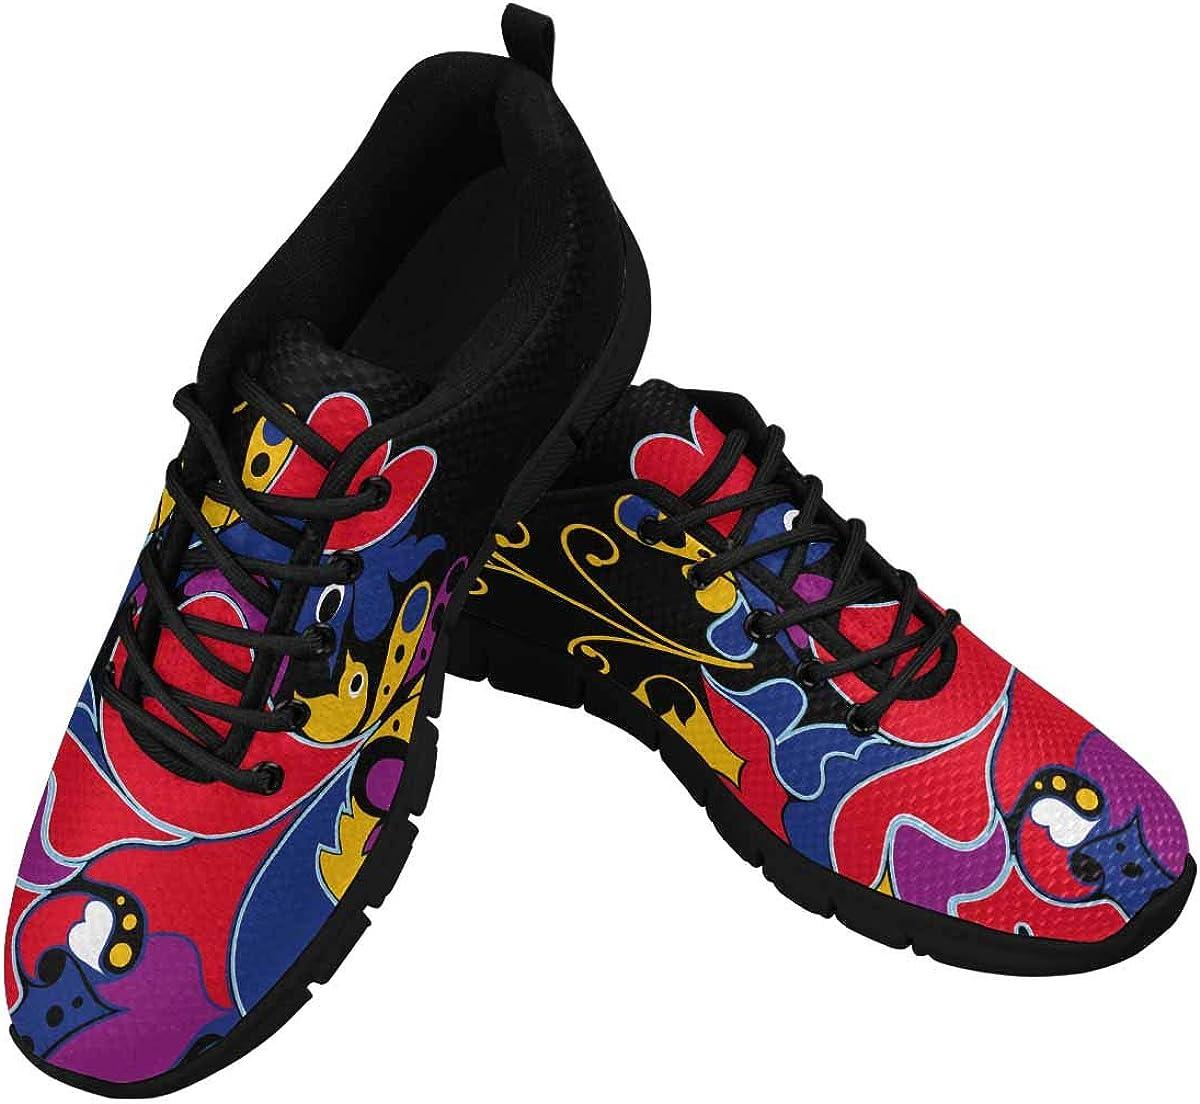 InterestPrint Cute Heart Bird Women's Athletic Walking Shoes Breathe Comfort Mesh